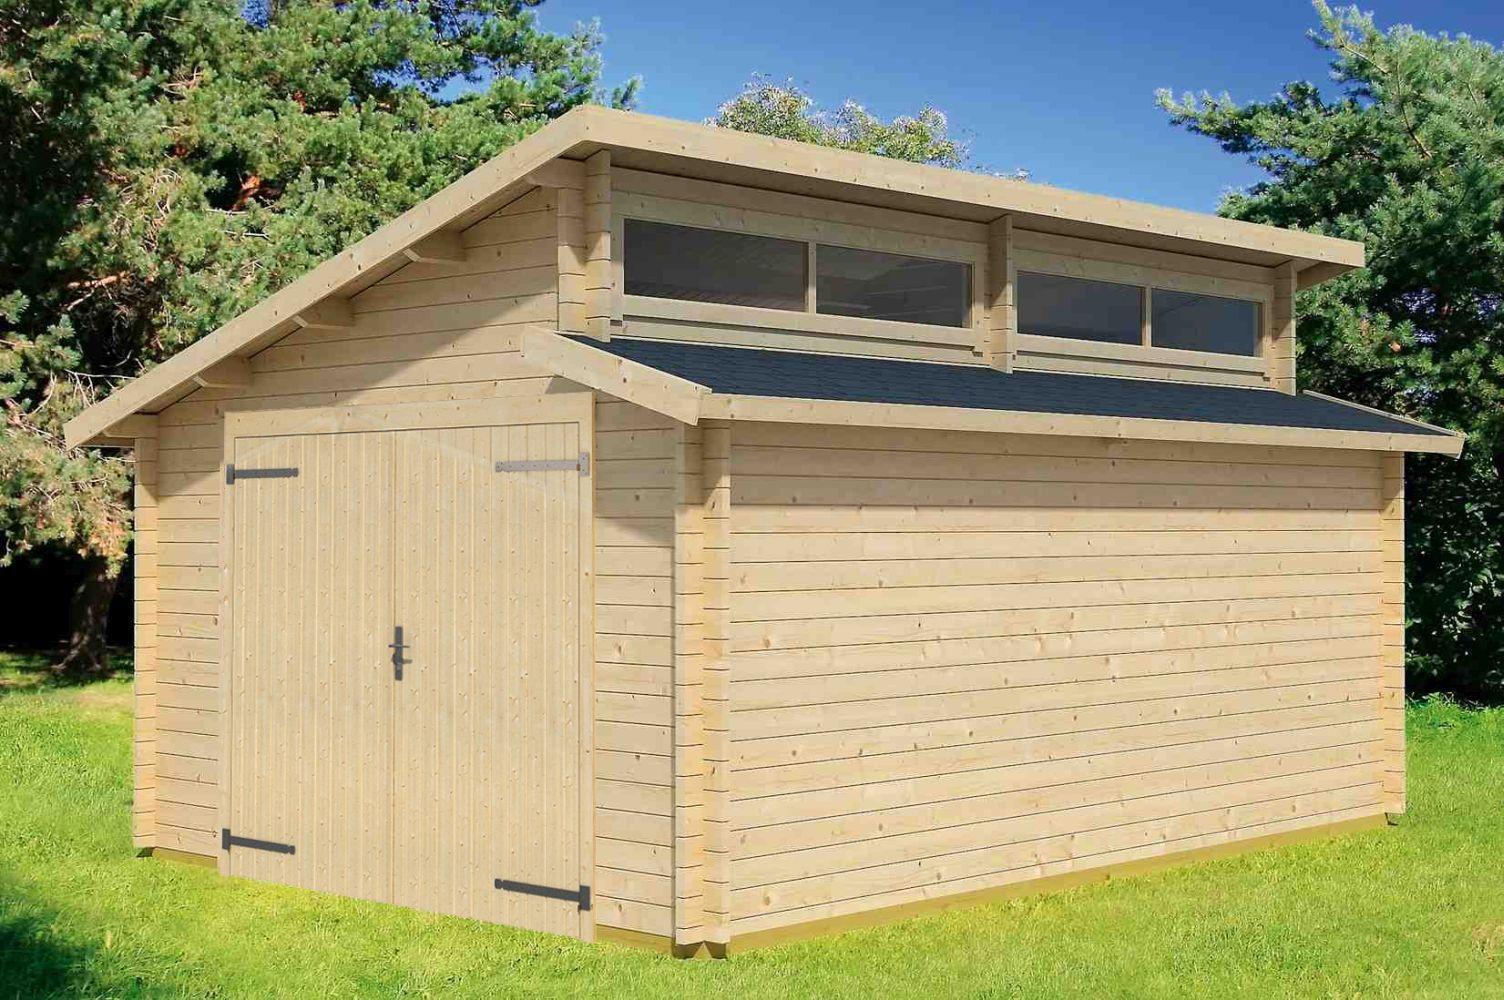 Holzgarage H165 inkl. Holztor - 44 mm Blockbohlenhaus, Grundfläche: 20,30 m², Stufendach